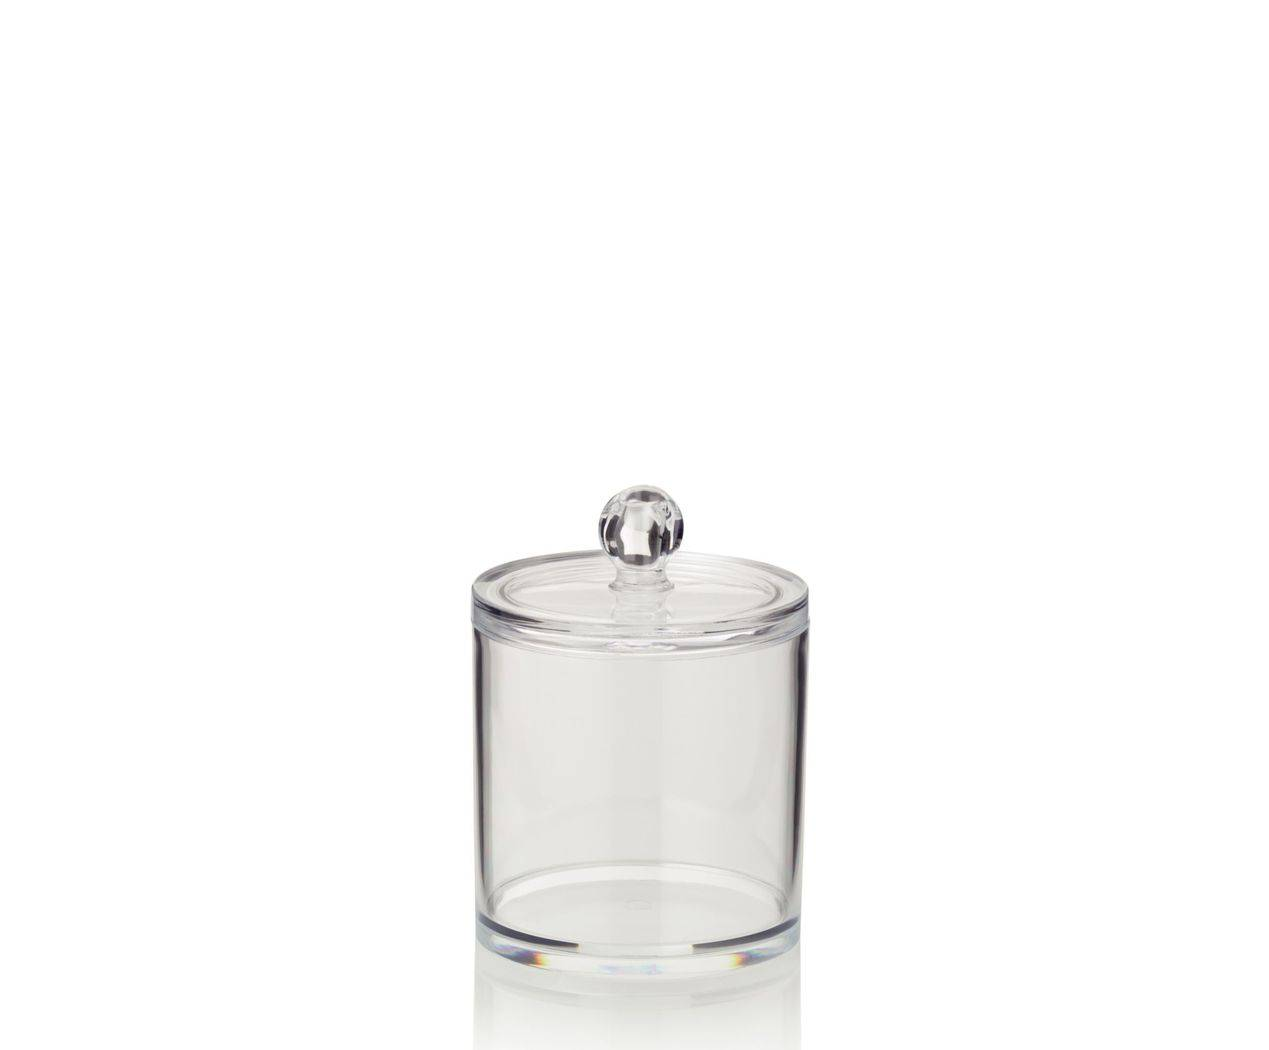 Dóza na vatu SAFIRA plast, transparent, 9,5x13cm - Kela